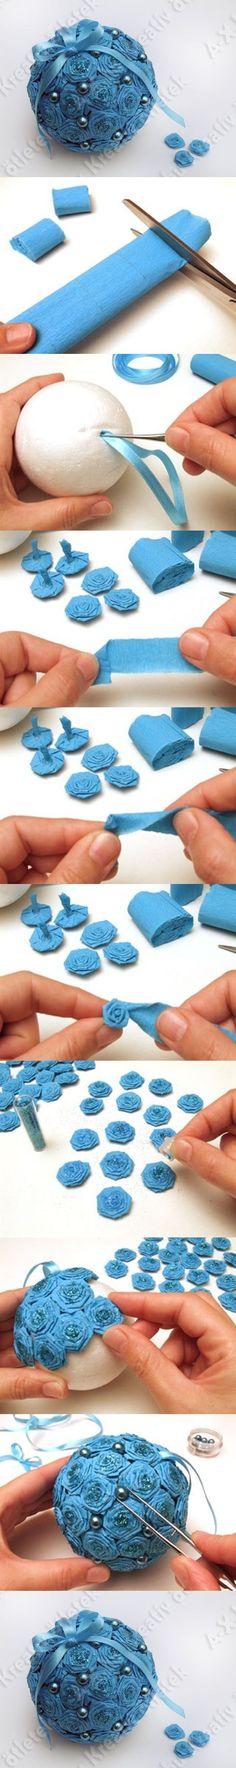 DIY Styrofoam Rose Ball Ornament | iCreativeIdeas.com Like Us on Facebook ==> https://www.facebook.com/icreativeideas